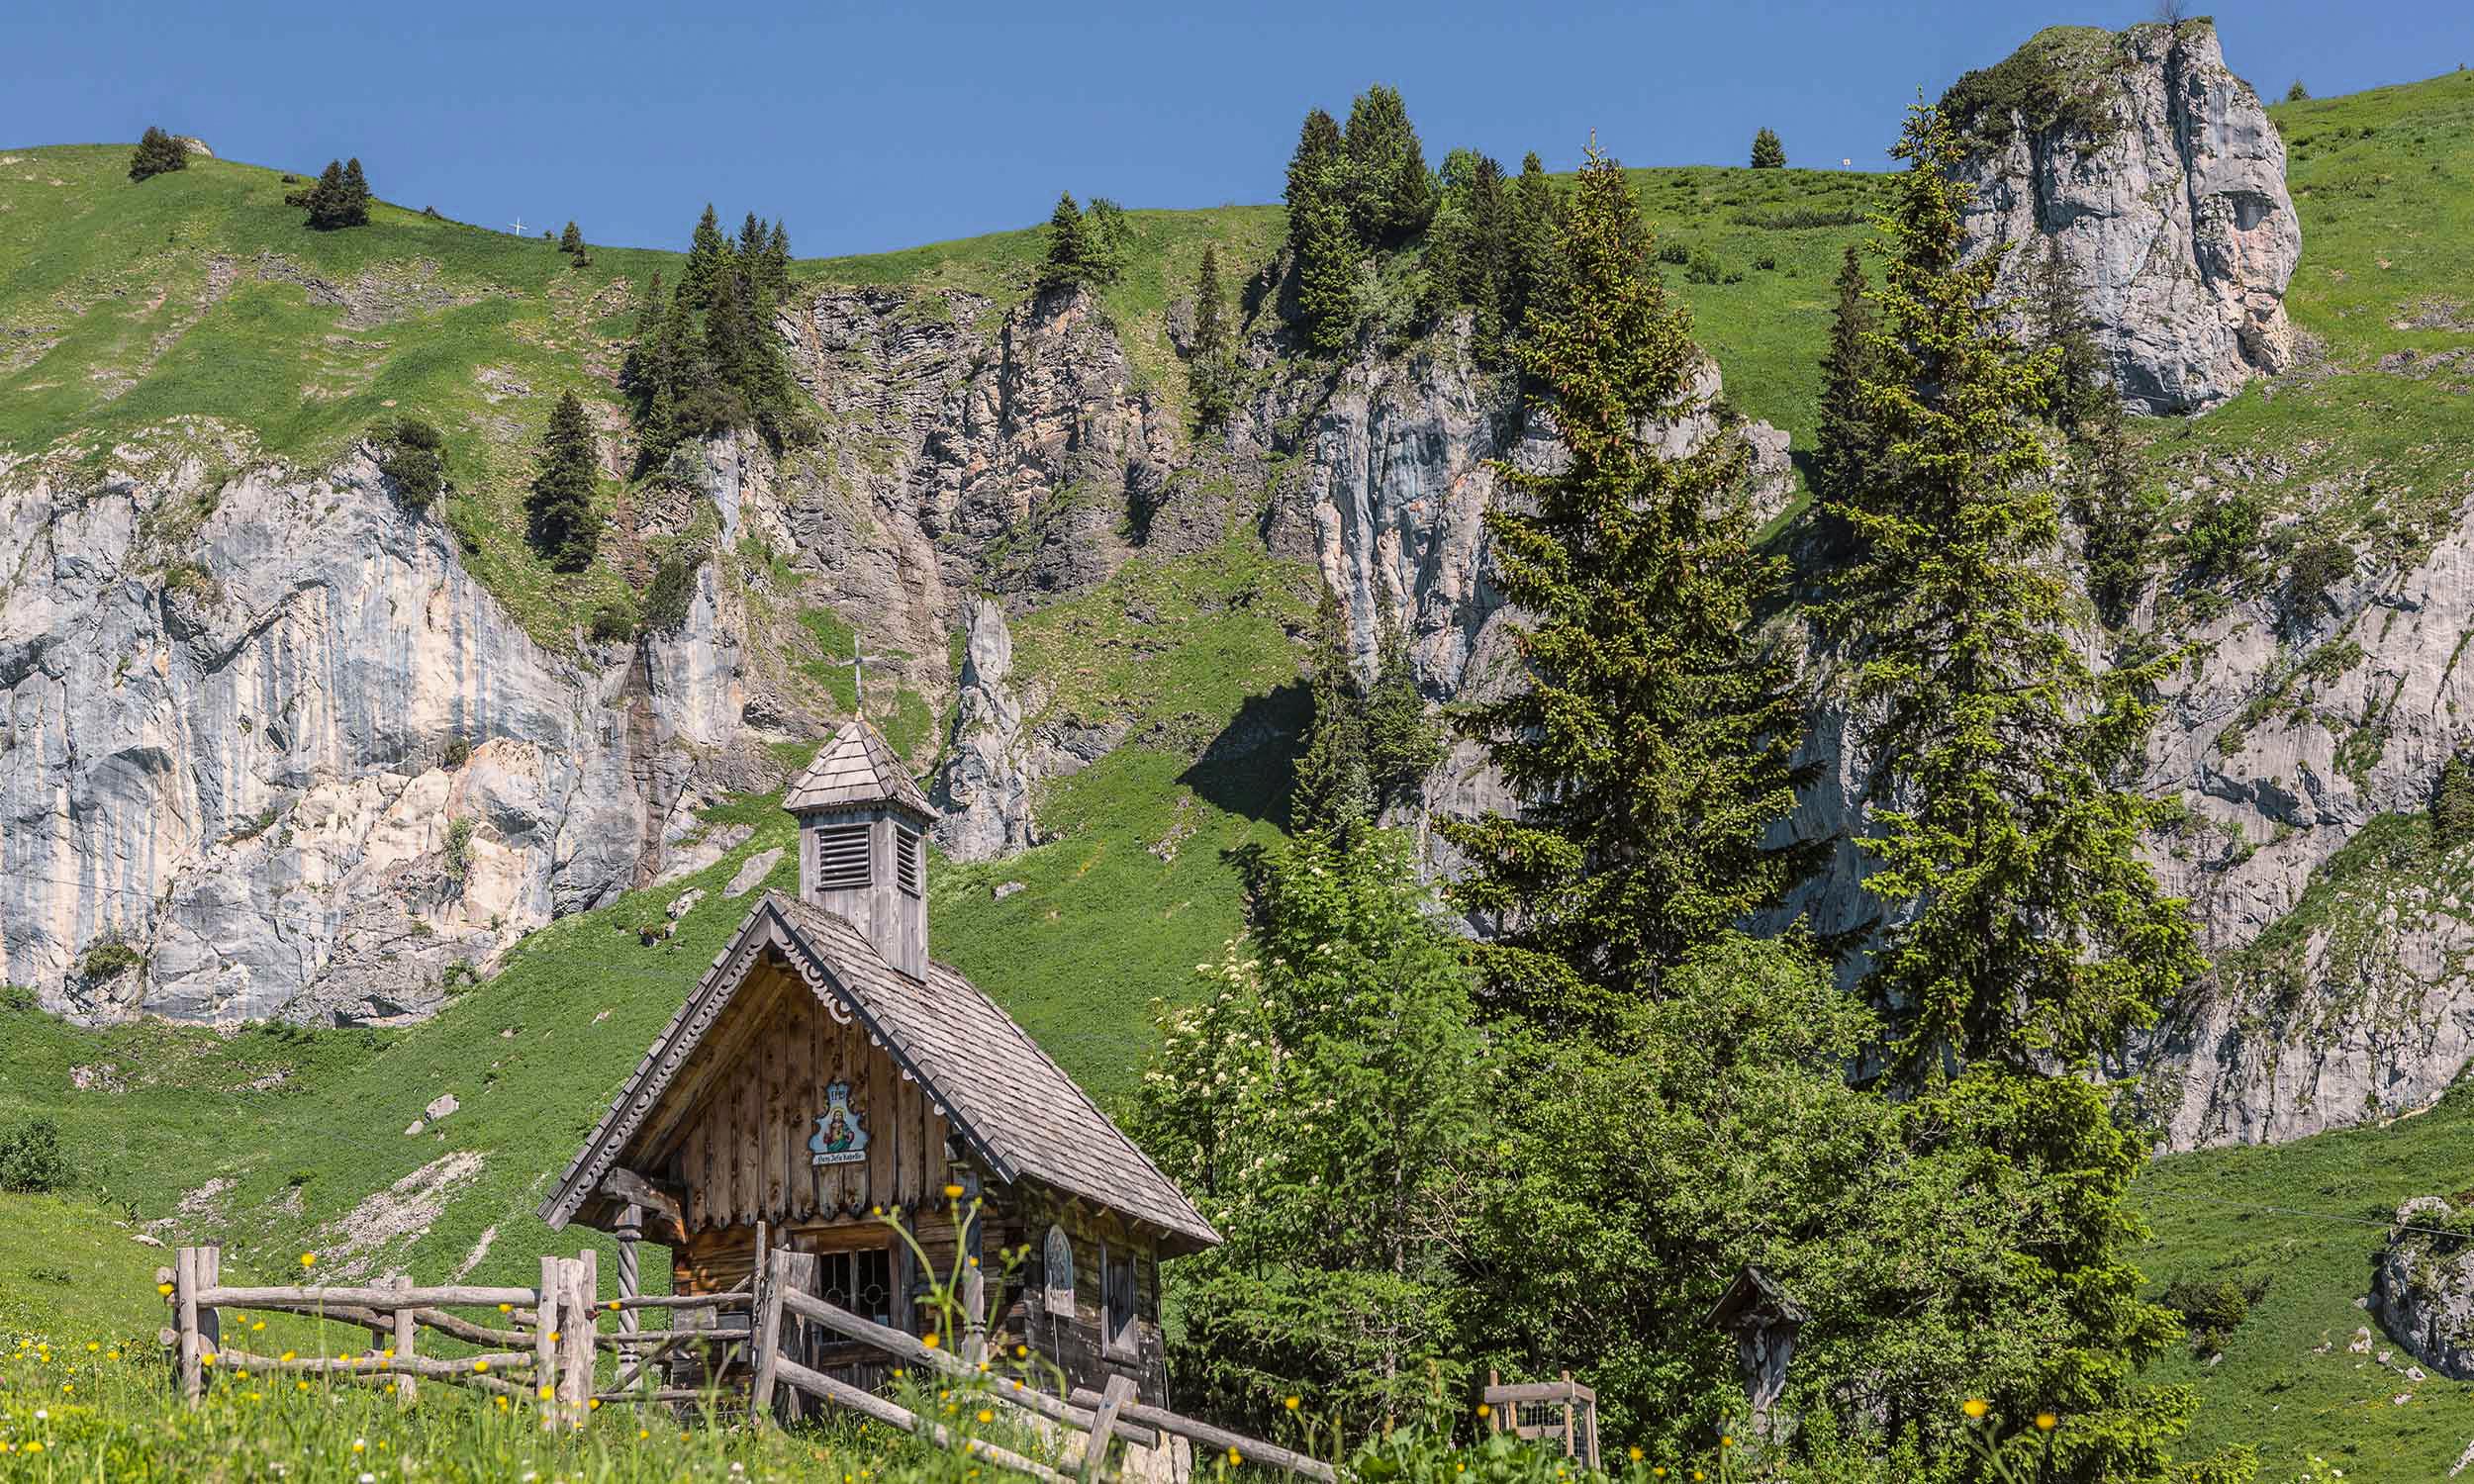 Kapelle unter den Felswänden im Sommer